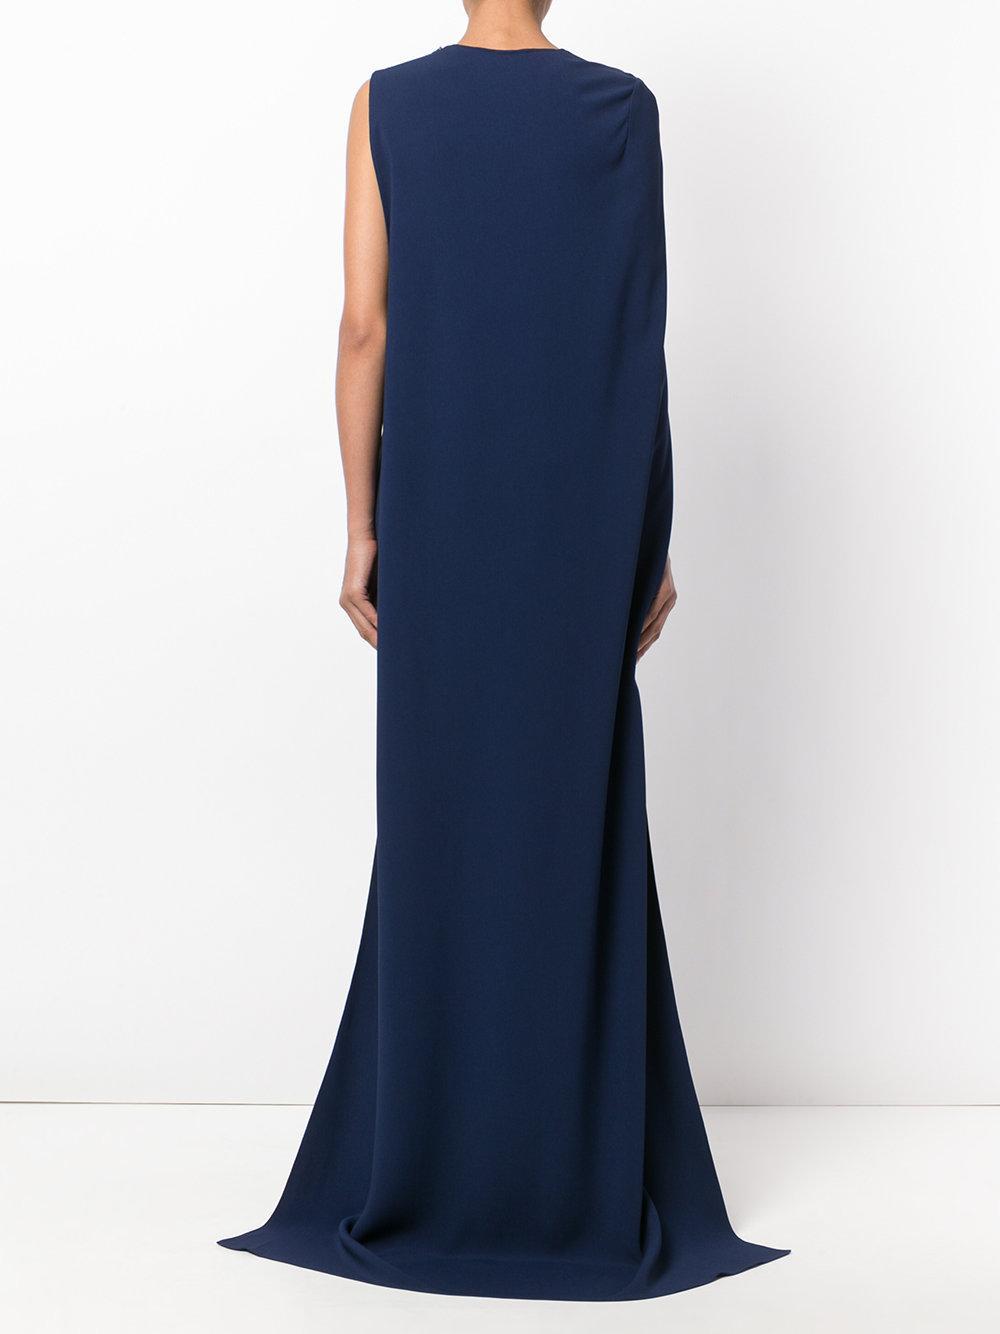 Stella McCartney Silk Mirabelle Gown in Blue